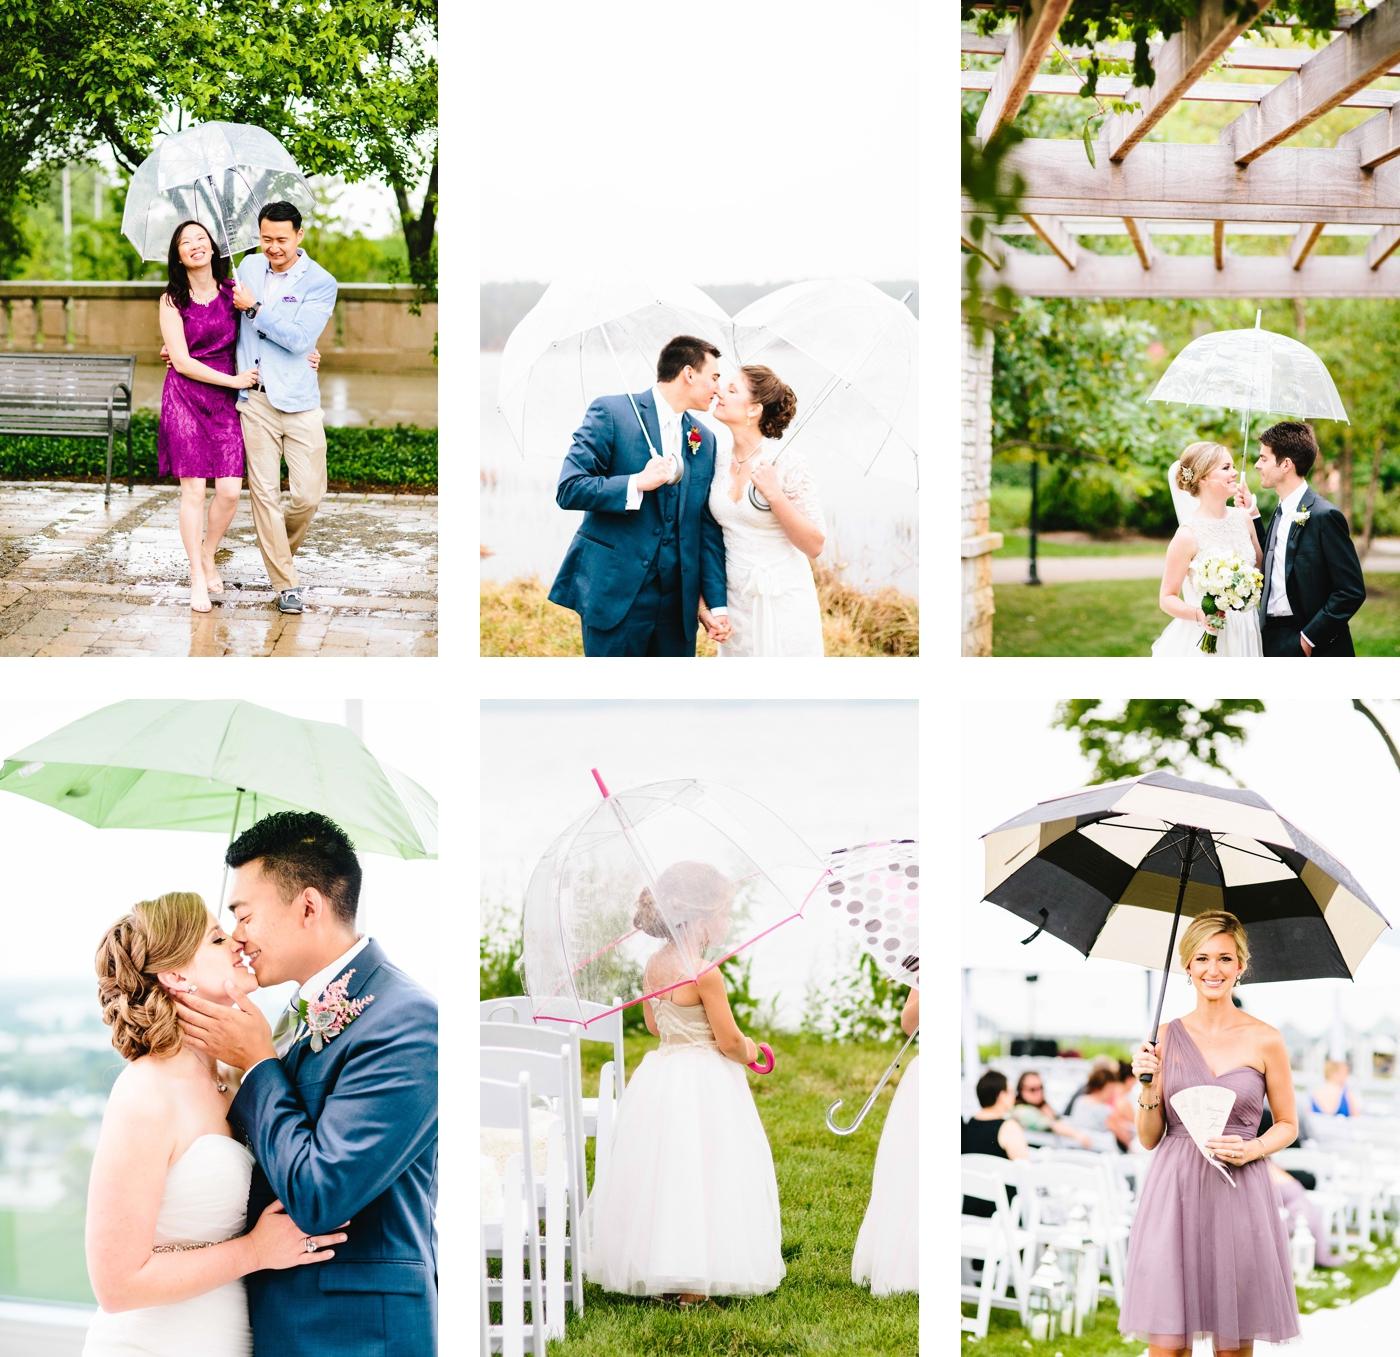 chicago-fine-art-wedding-photography-aprilshowers1